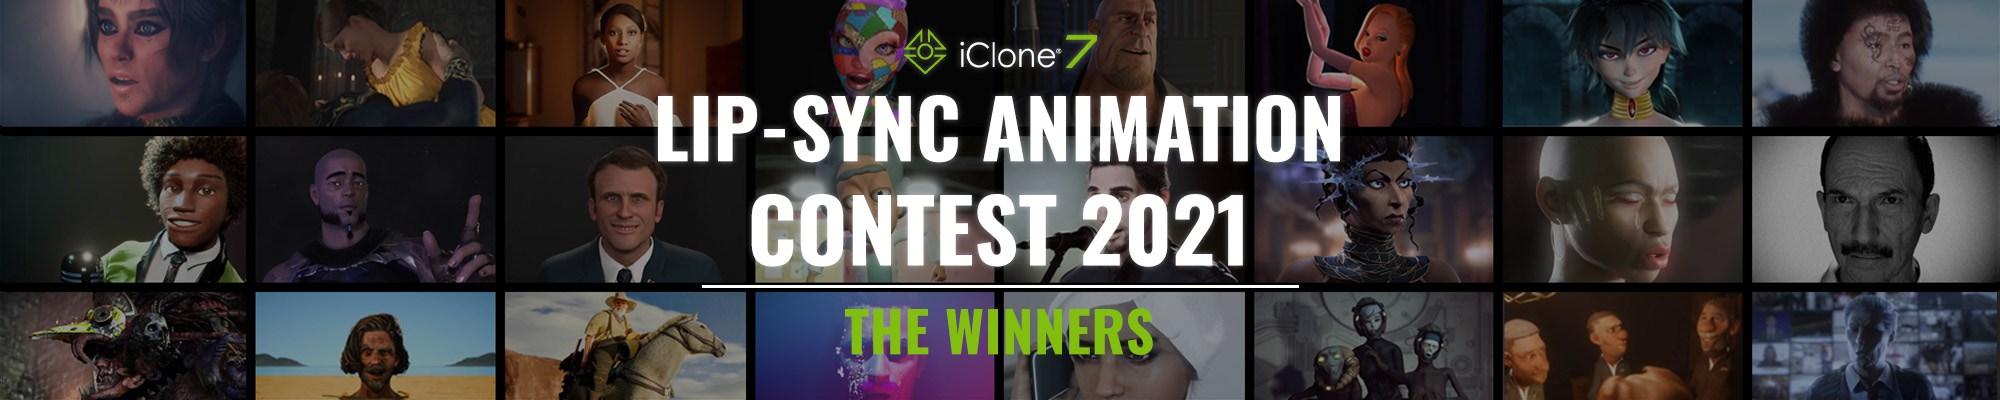 iClone Lip-sync Animation Contest 2021 - Winners